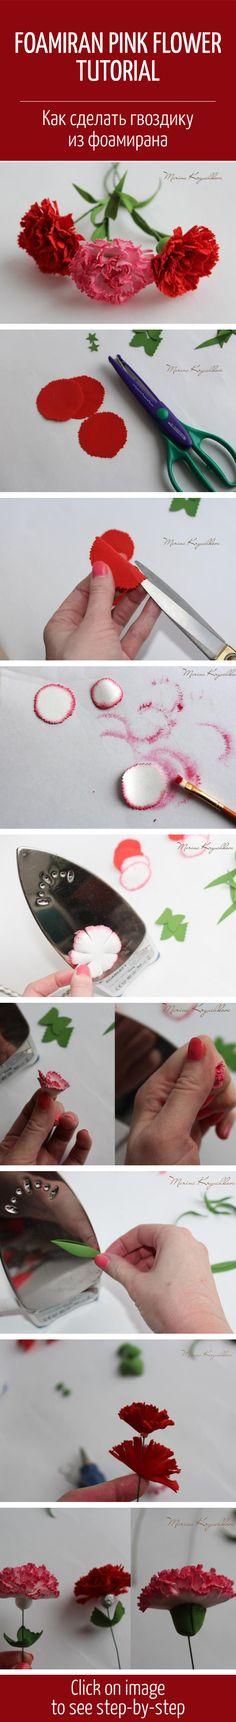 Foamiran Pink Flower Tutorial / Лепим цветок гвоздики из фоамирана How To Make Paper Flowers, Tissue Paper Flowers, Fabric Flowers, Hand Flowers, Clay Flowers, Foam Flower, Paper Flower Tutorial, Foam Crafts, Origami